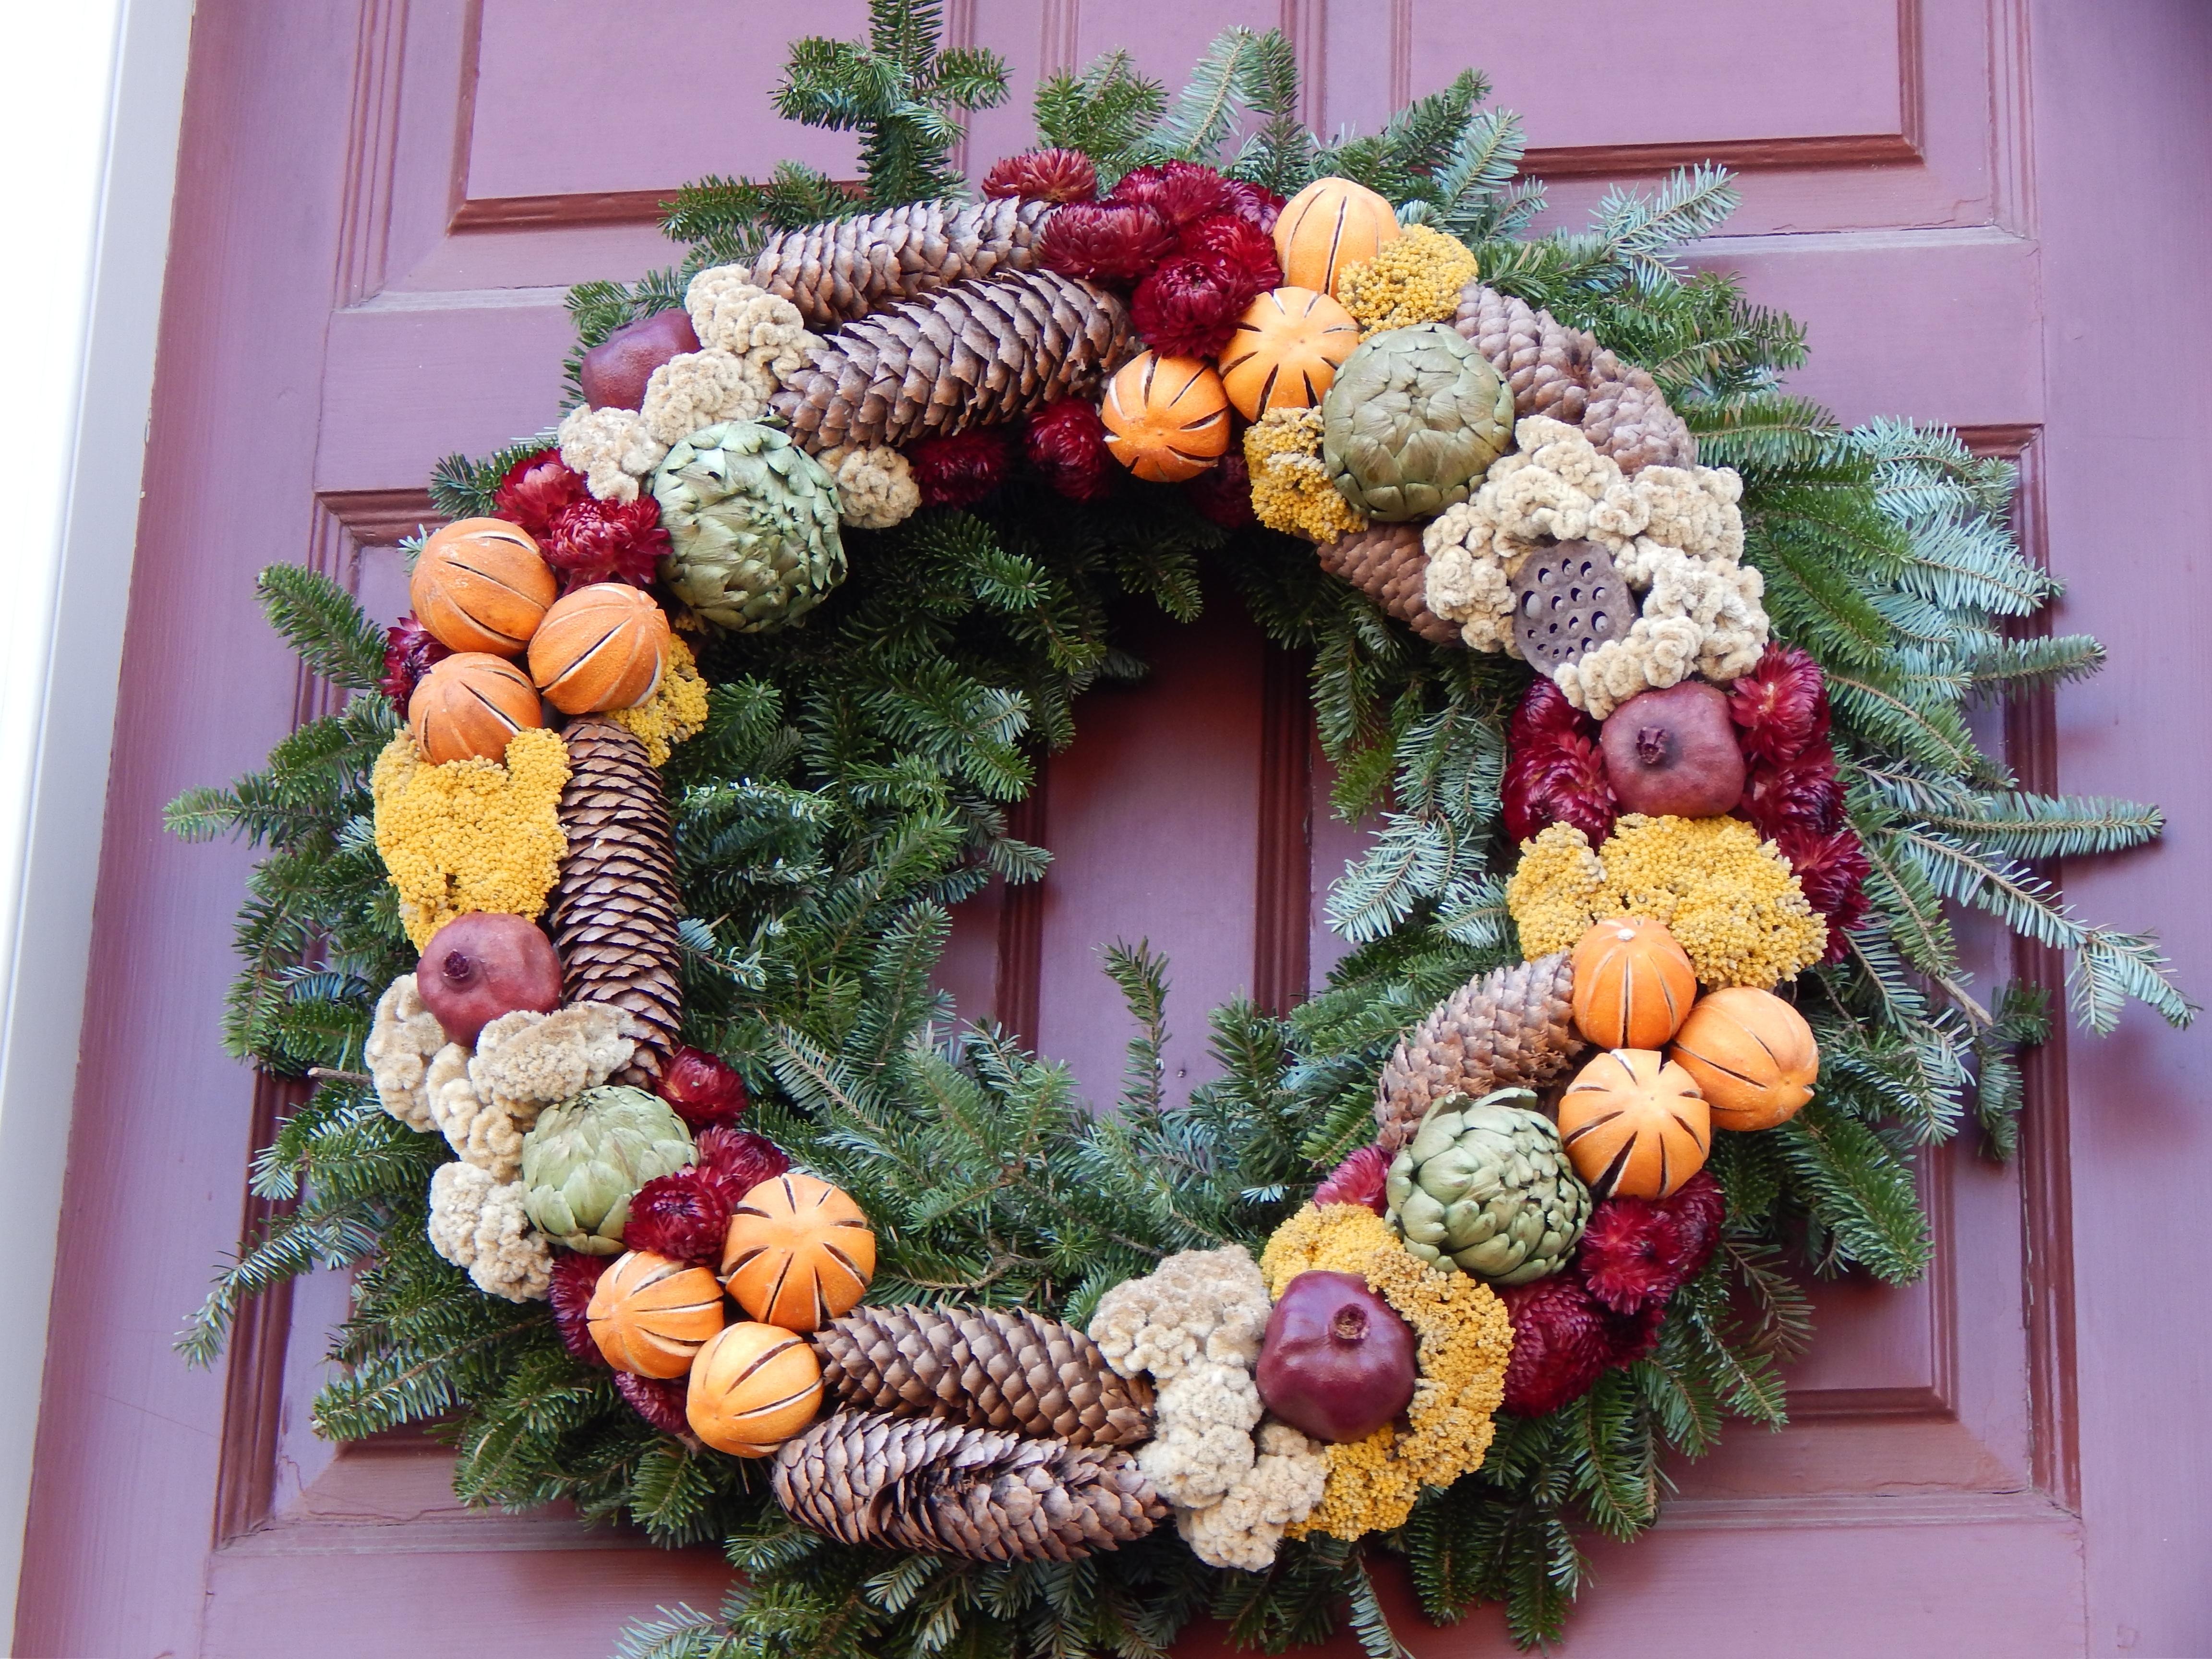 Fotos gratis naturaleza al aire libre invierno casa - Decoracion navidena natural ...